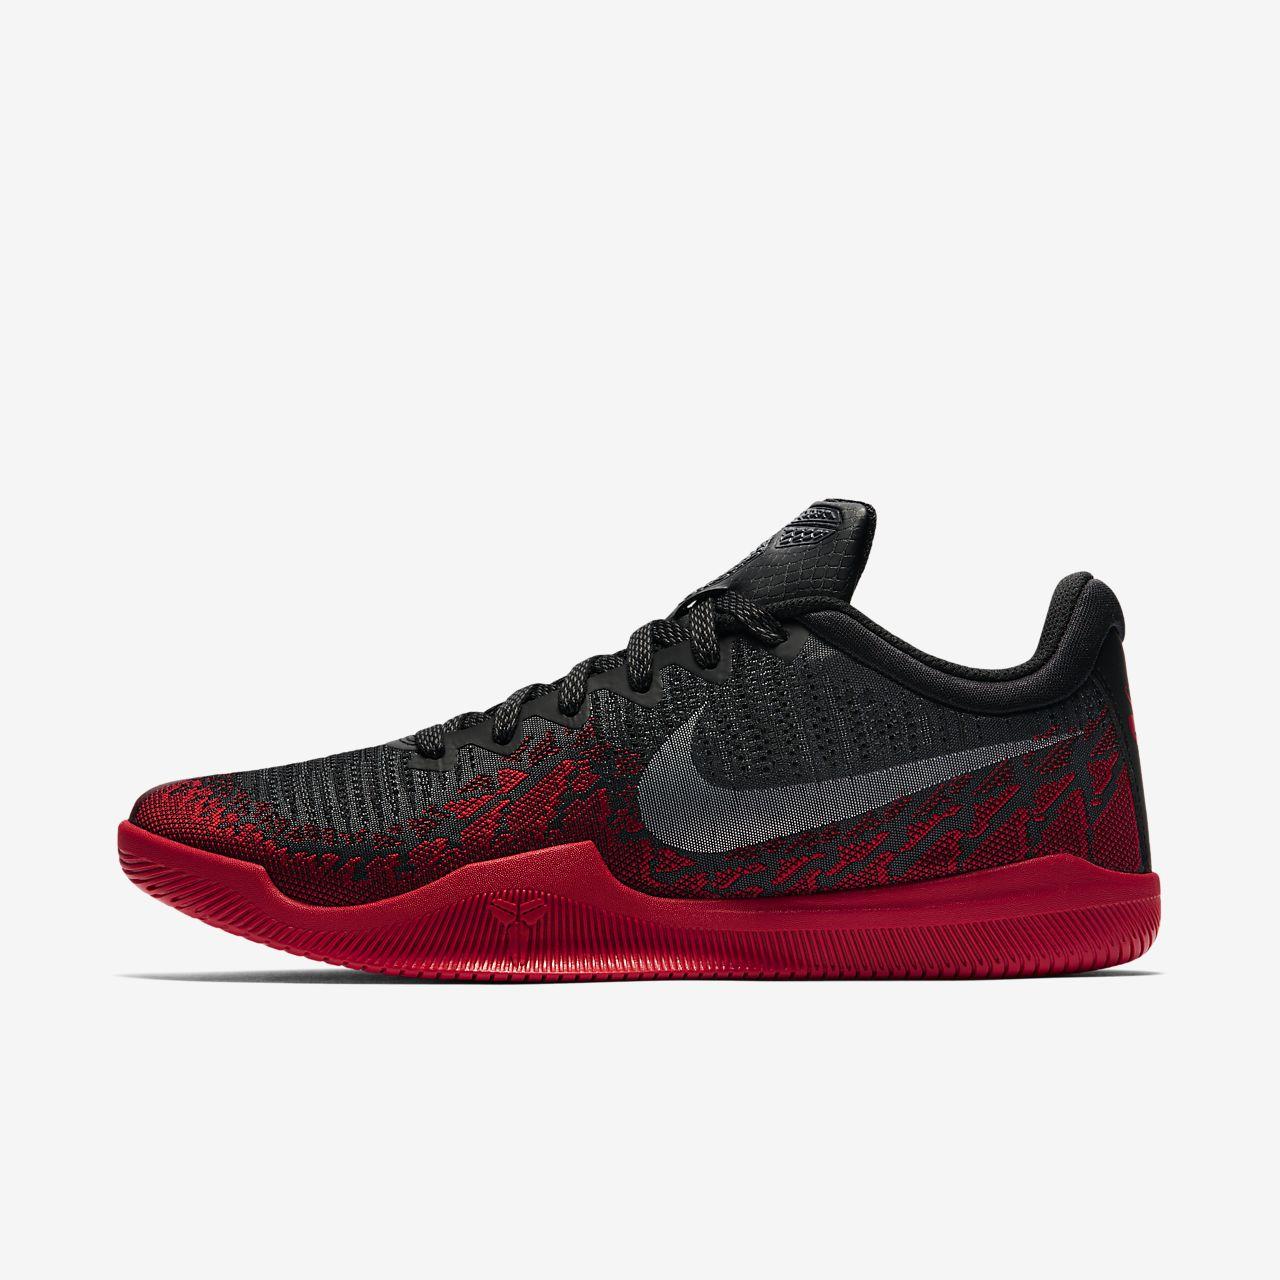 Chaussure de basketball Nike Mamba Rage Premium pour MA